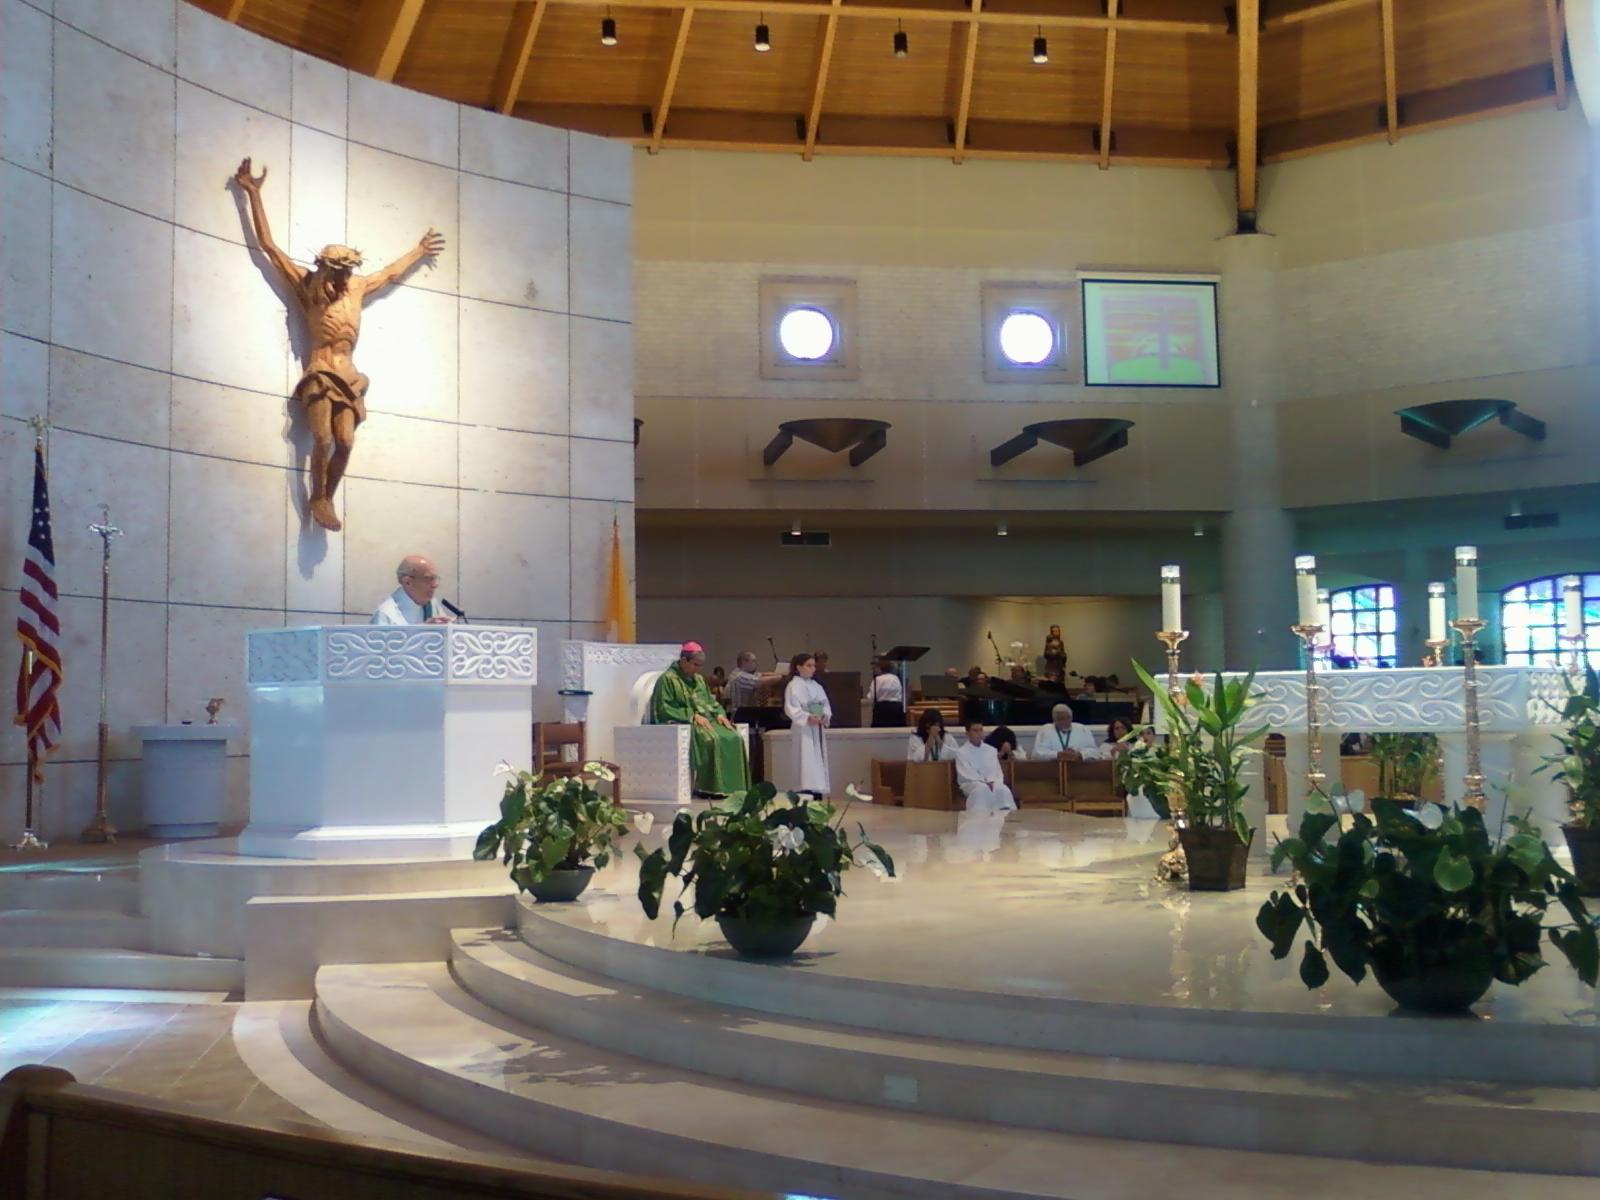 090830-1207_Brooklyn-Auxiliary-Bishop-Octavio-Cisneros-at-St-Mark-Parish